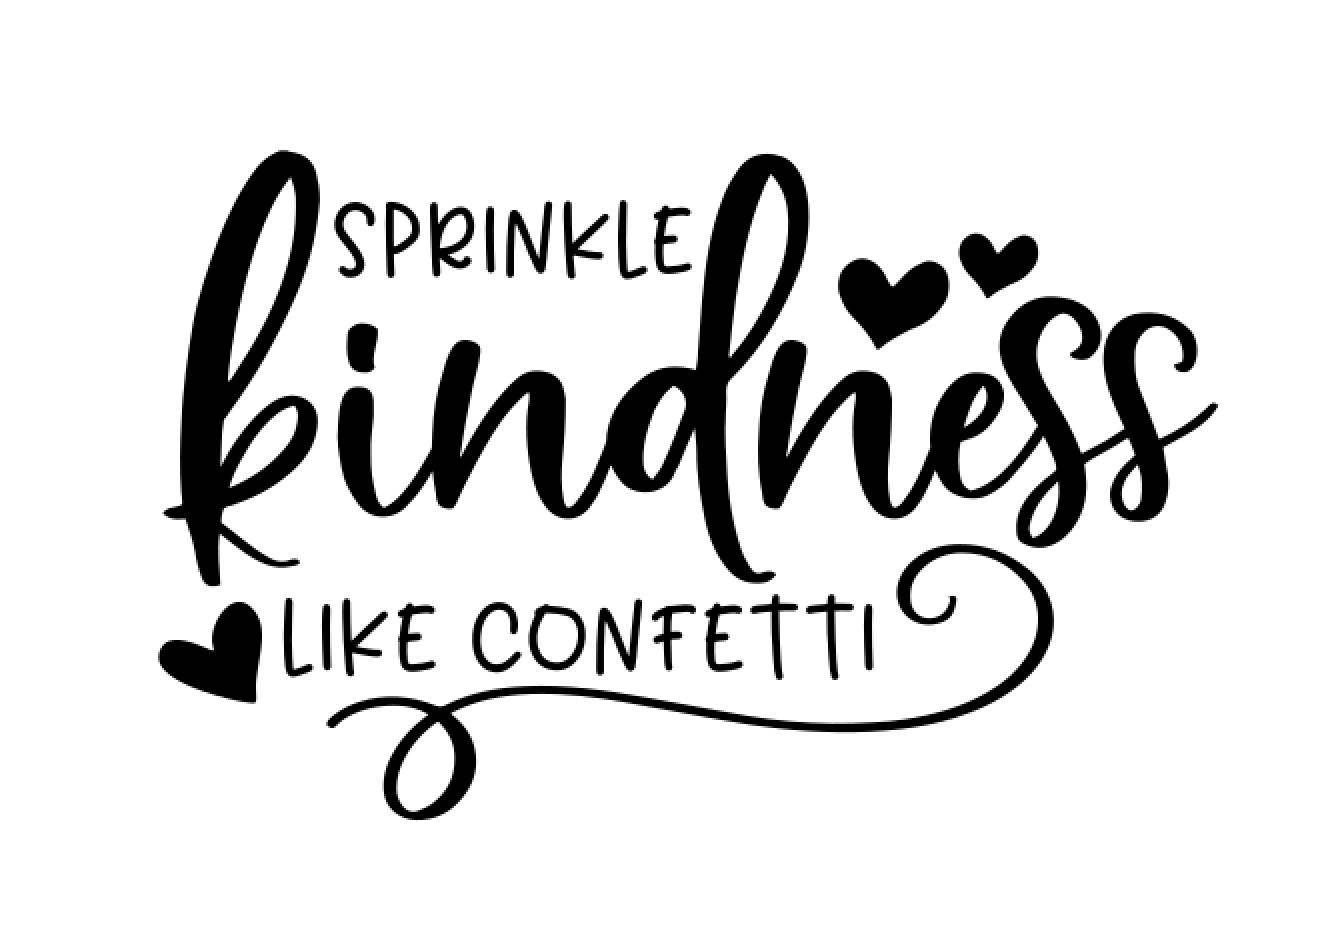 R2 Sprinkle kindness like